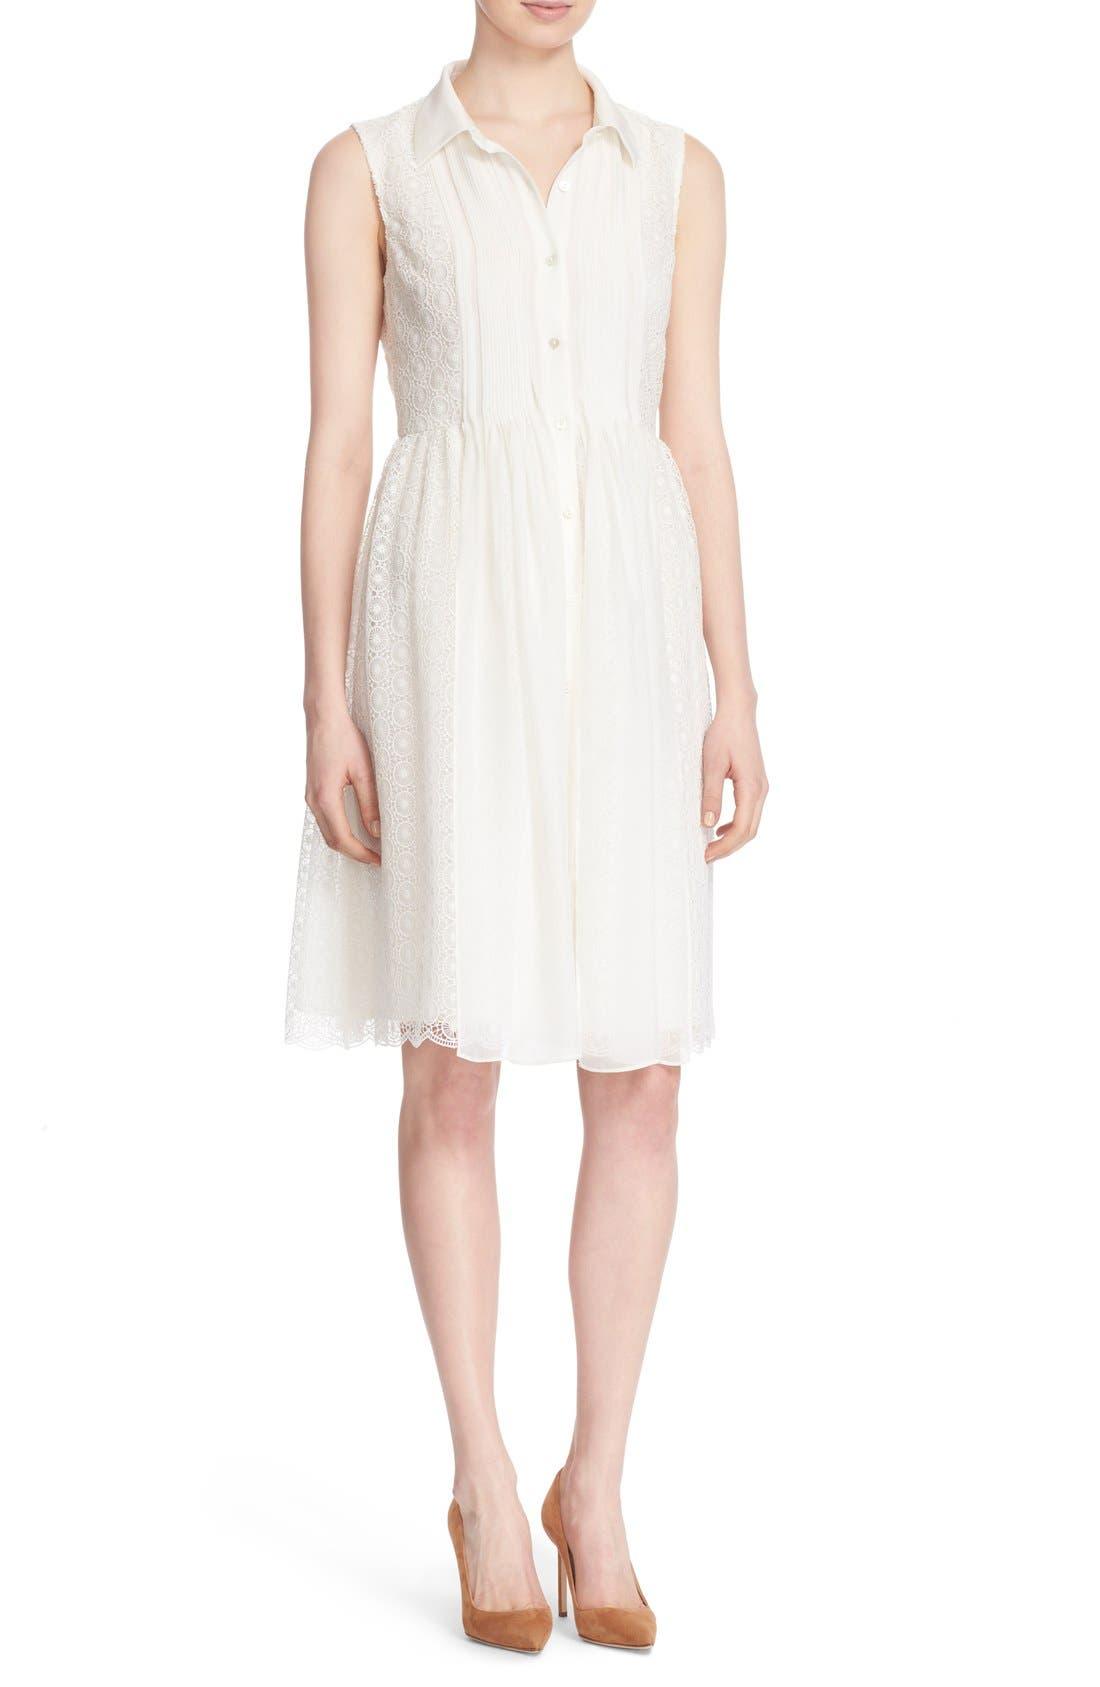 Alternate Image 1 Selected - Diane von Furstenberg 'Nieves' Sleeveless Lace Shirtdress